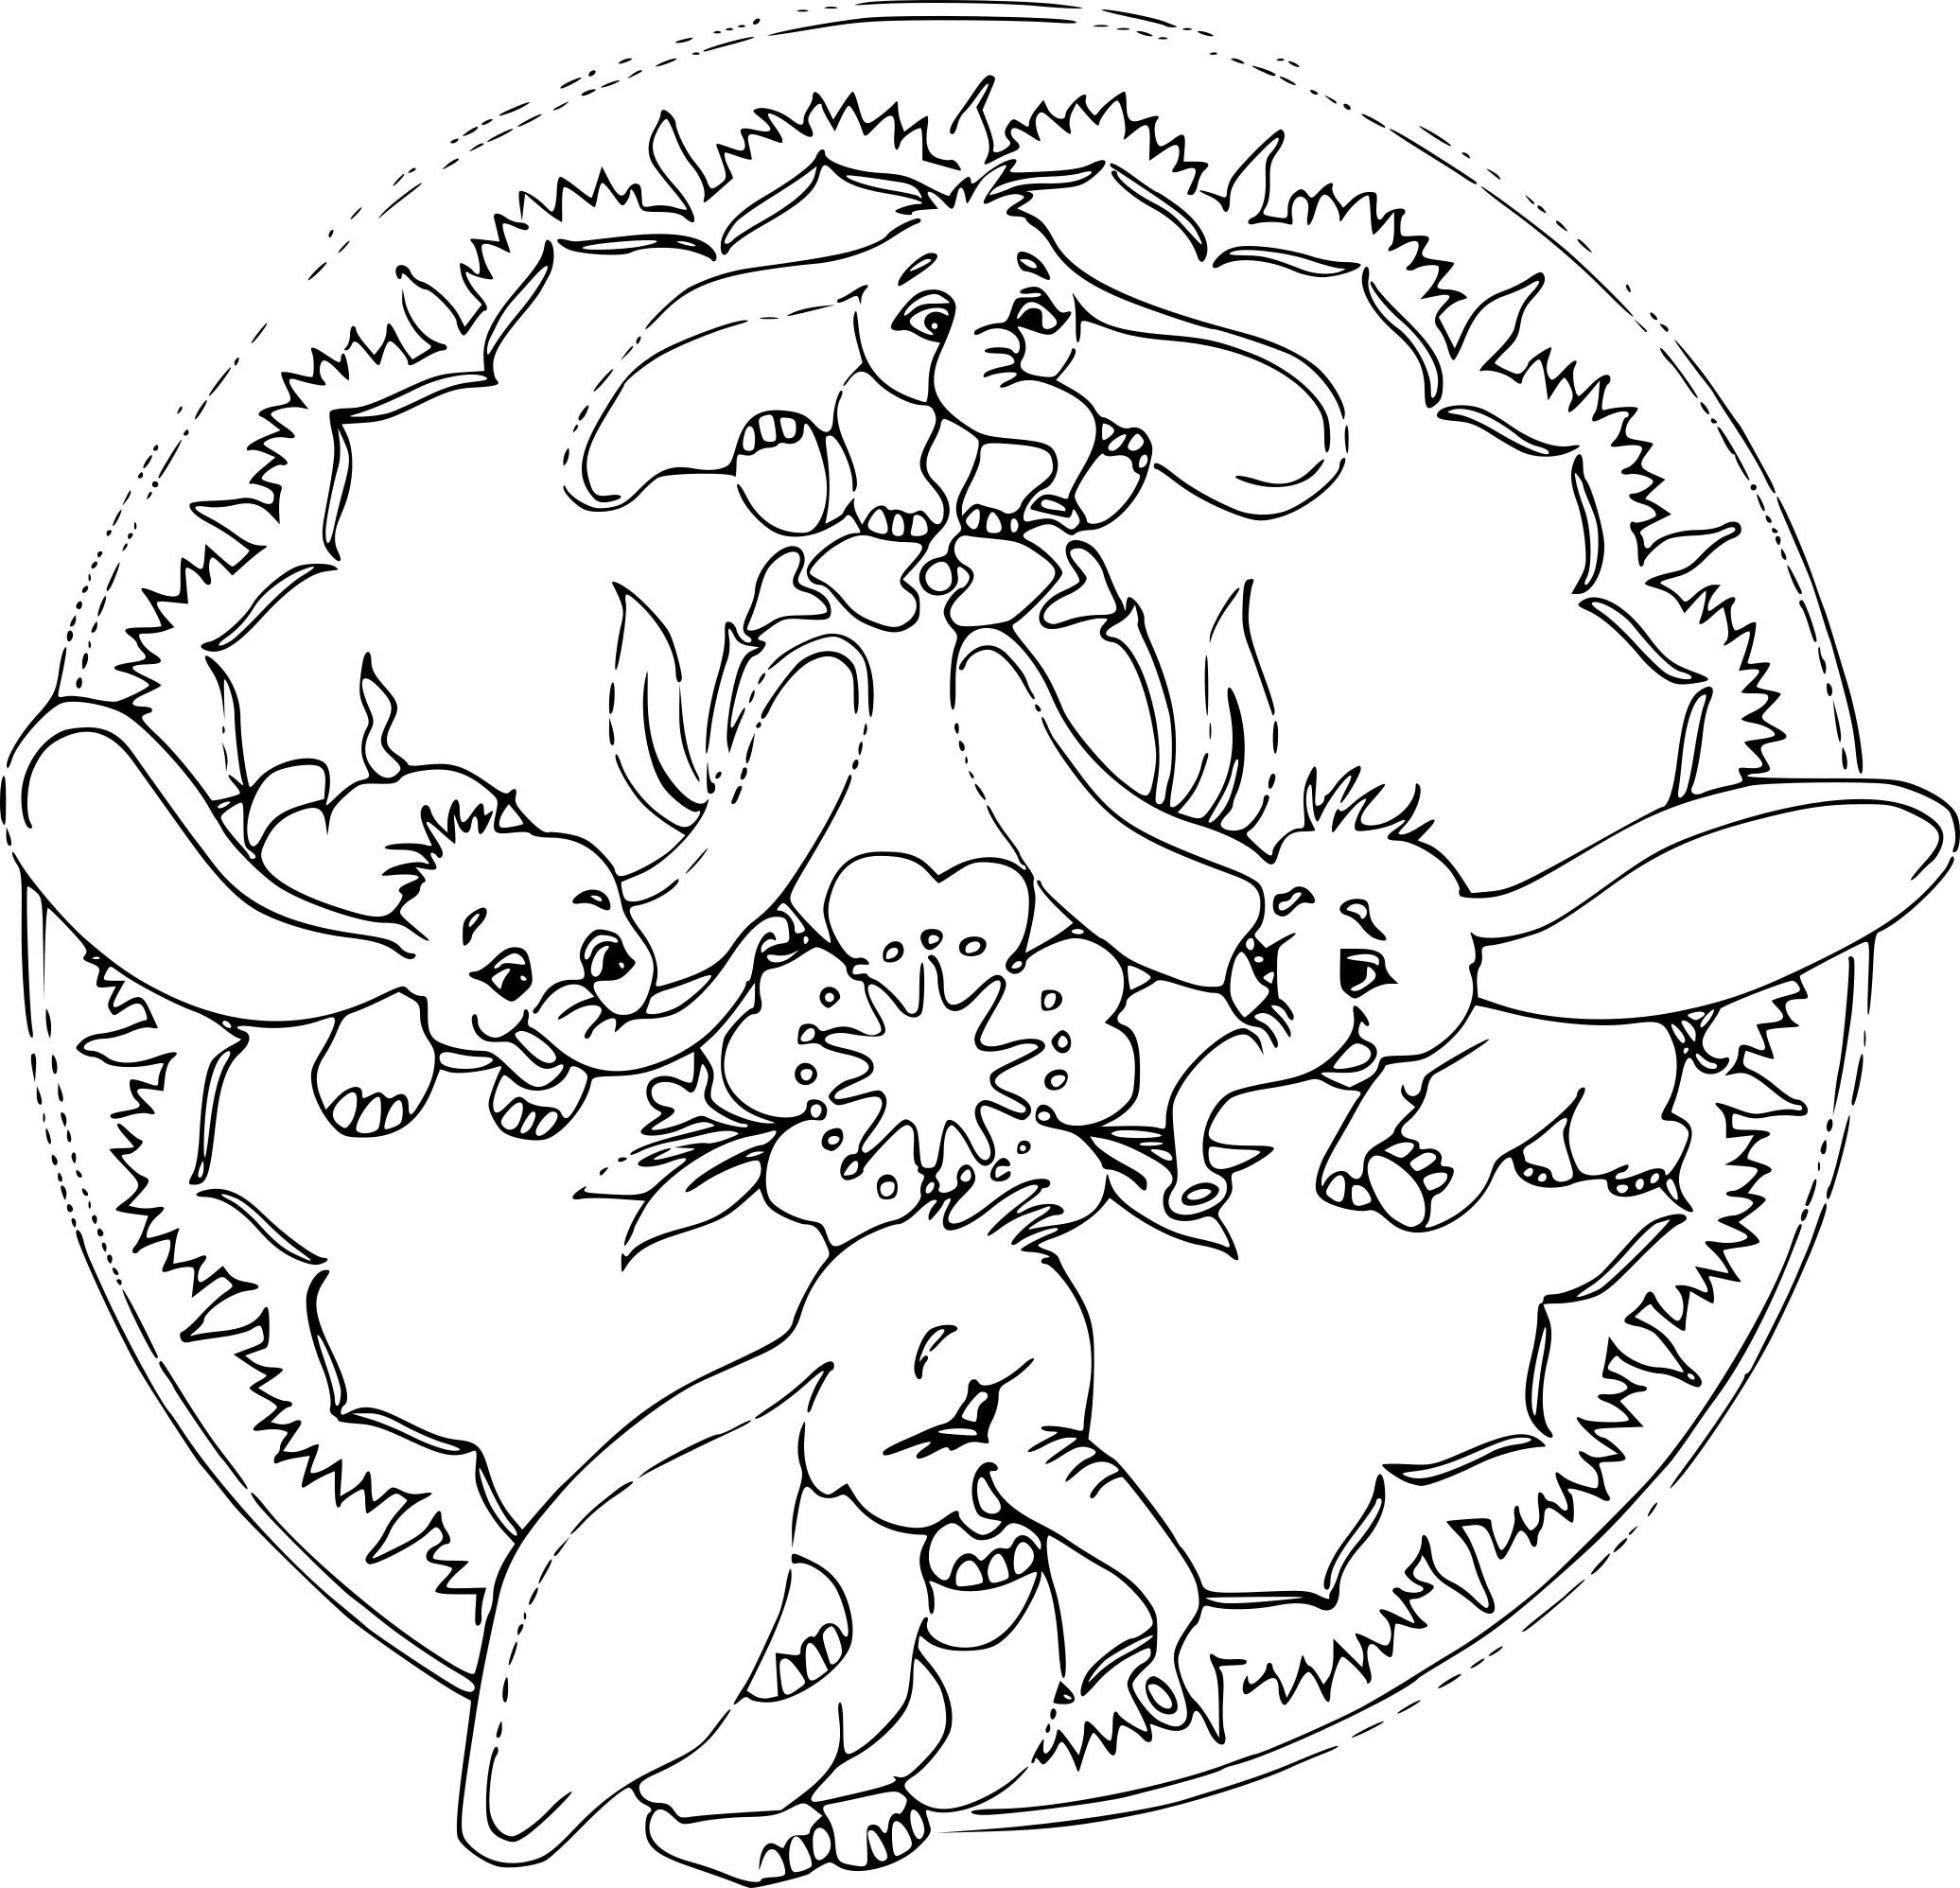 Coloriage la reine des neiges tattoo design bild - Coloriage a imprimer mandala ...